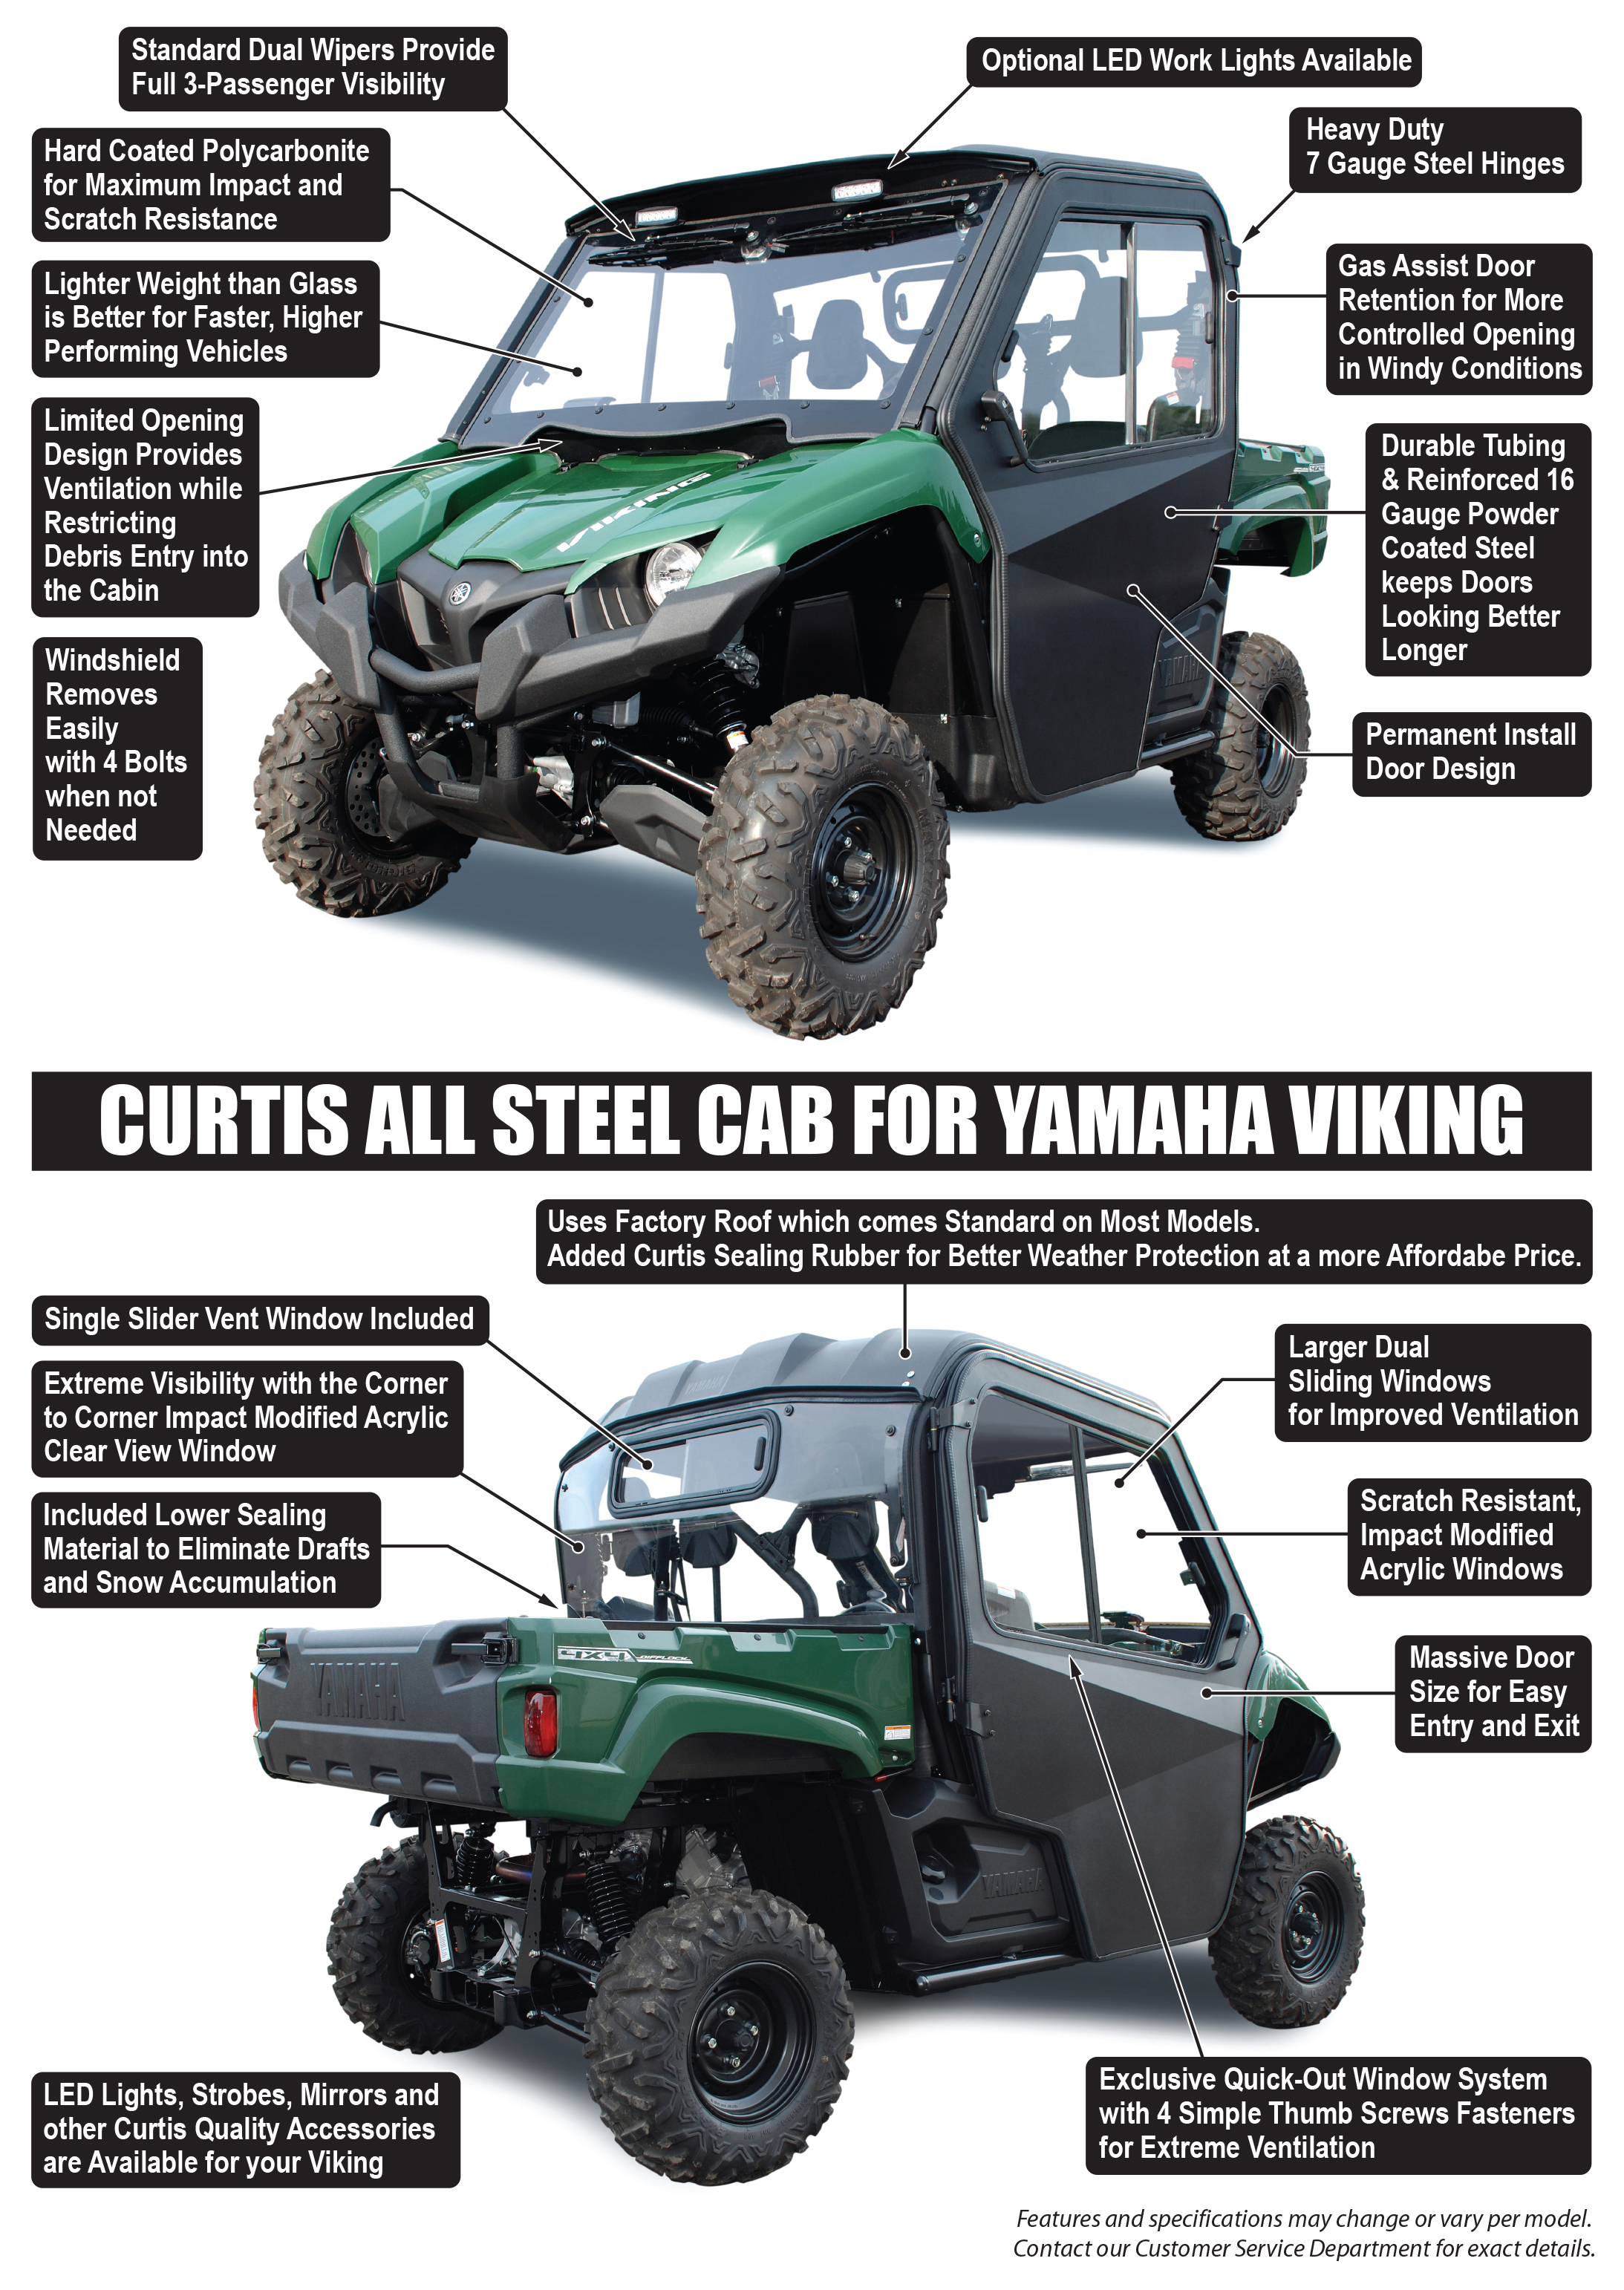 Yamaha Viking Cab